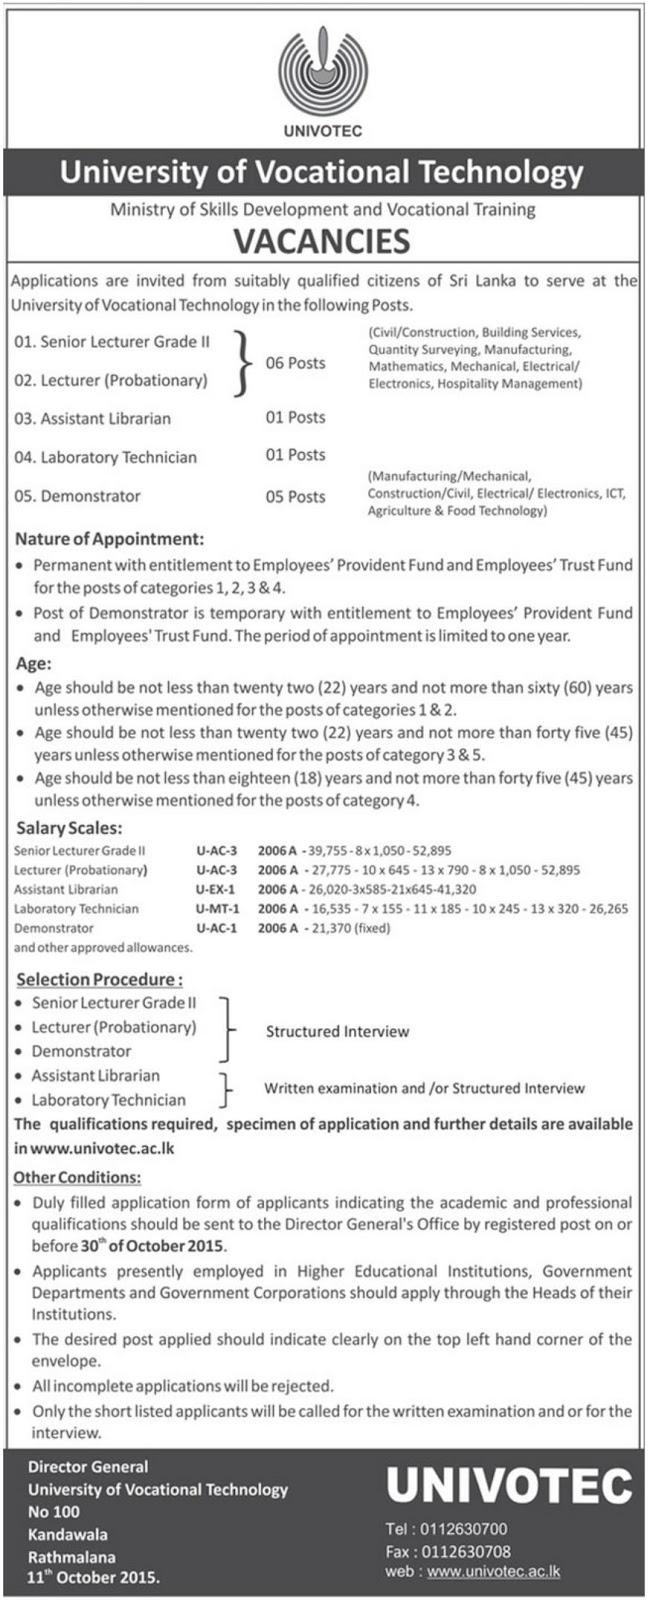 vacancies at university of vocational technology government jobs vacancies at university of vocational technology